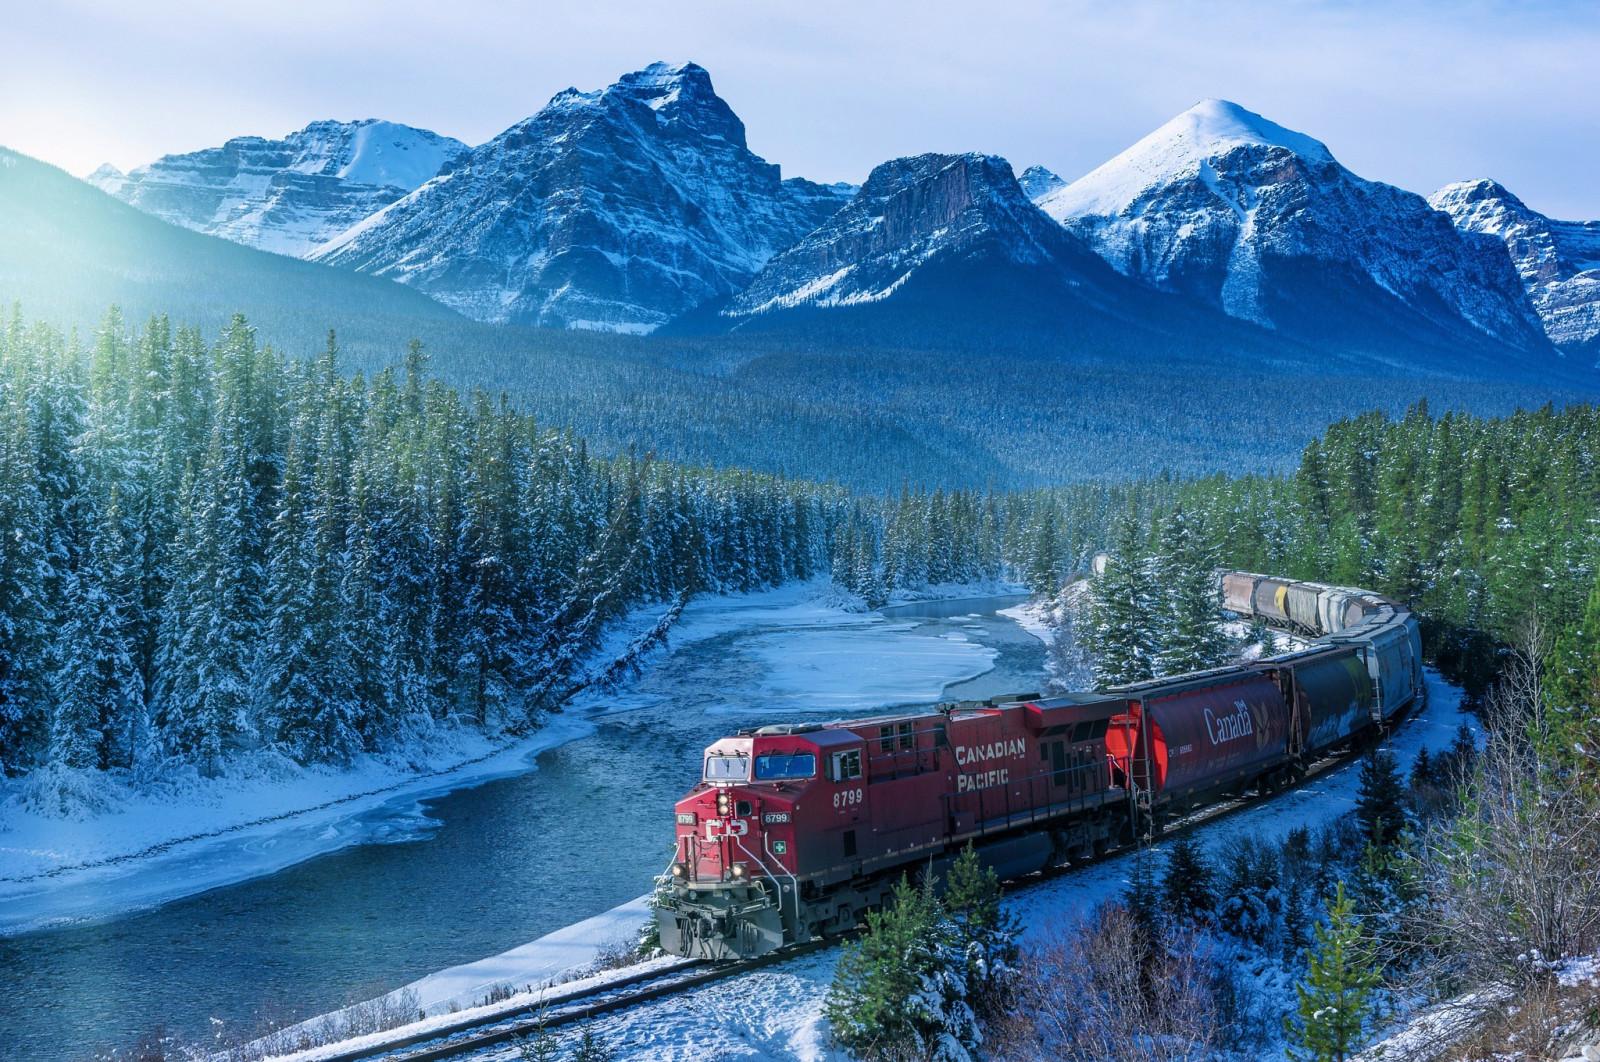 Wallpaper Pemandangan Hutan Salju Musim Dingin Kendaraan